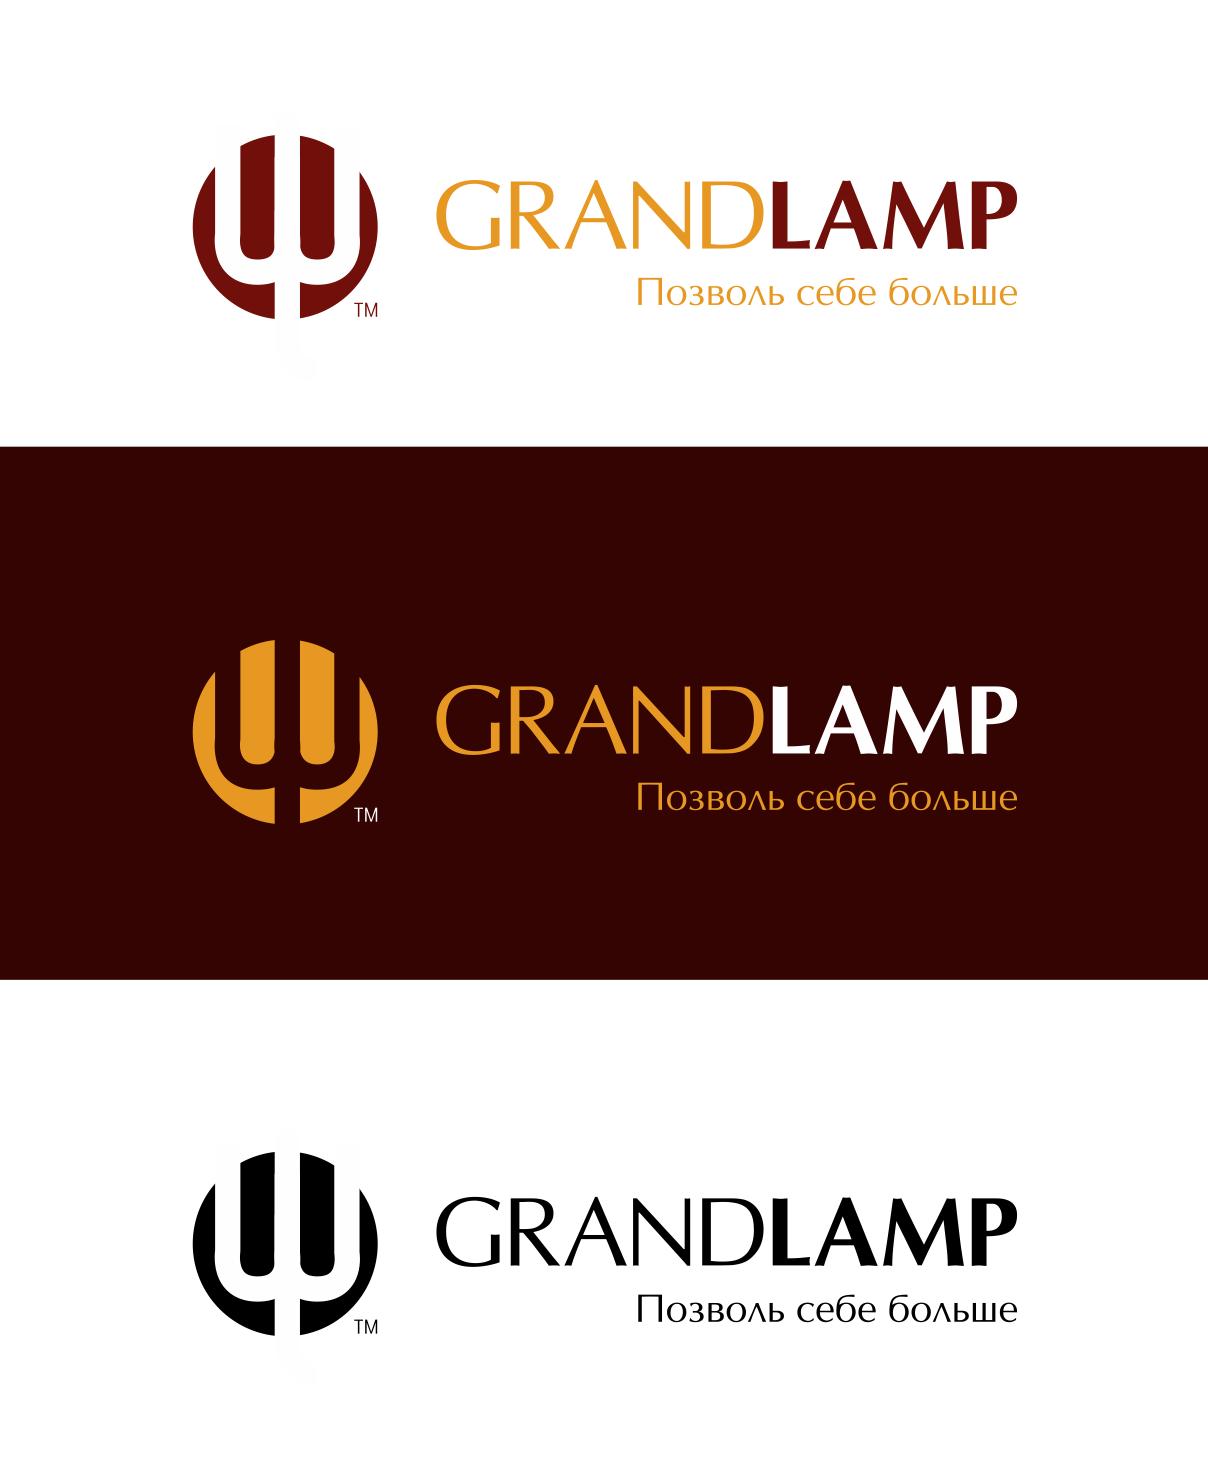 Разработка логотипа и элементов фирменного стиля фото f_59957dfaeb077ee4.png